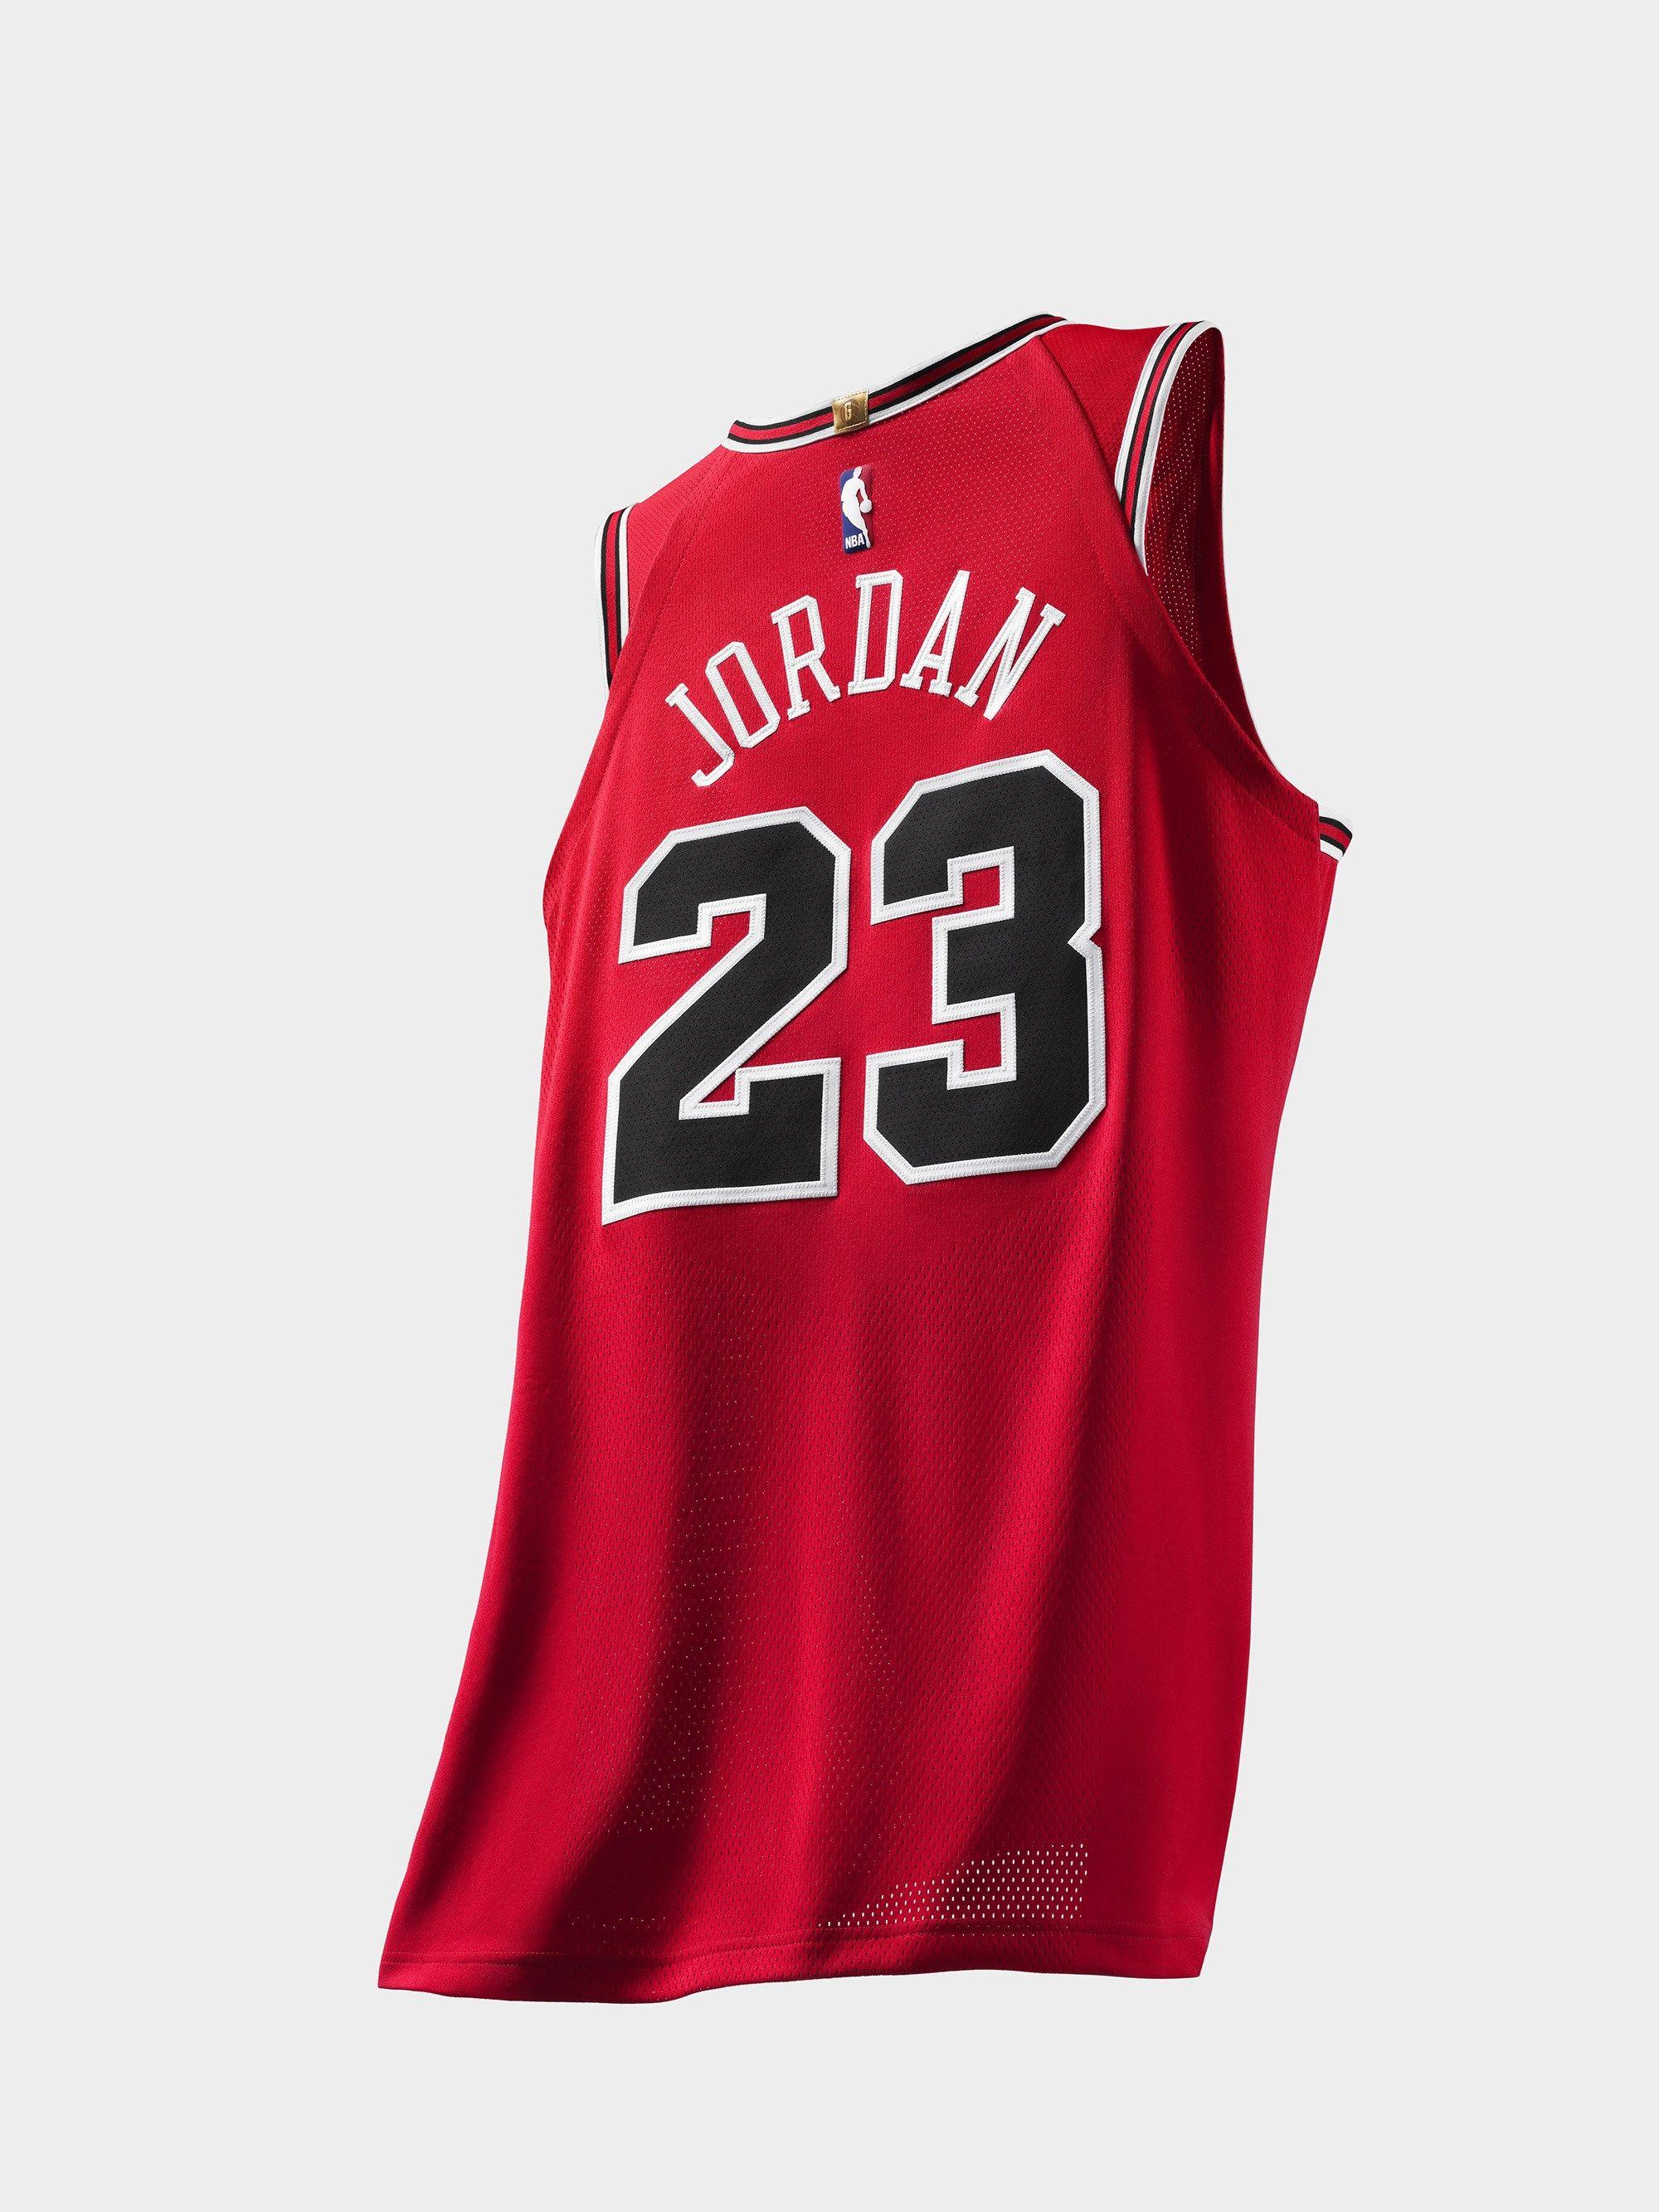 88f8f3efc70 Nike to Release Michael Jordan Chicago Bulls